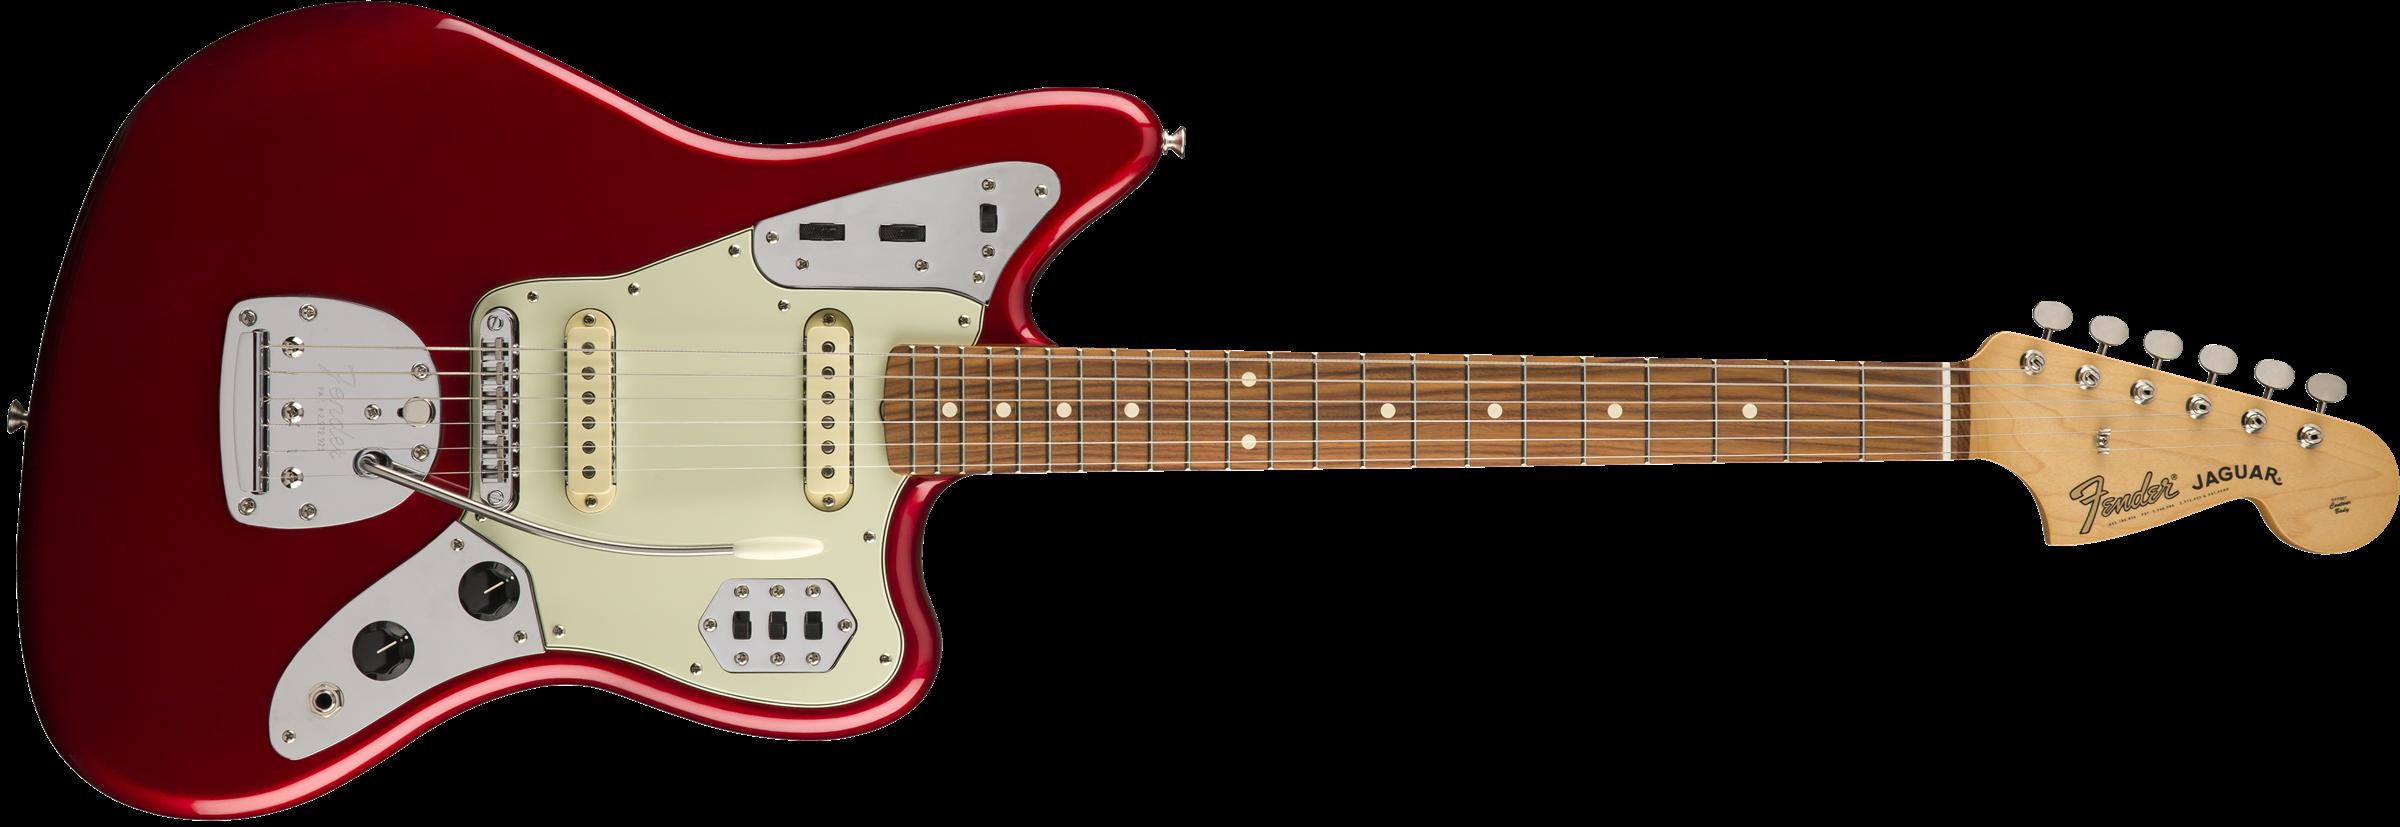 FENDER Classic Player Jaguar Special, Pau Ferro Fingerboard, Candy Apple Red